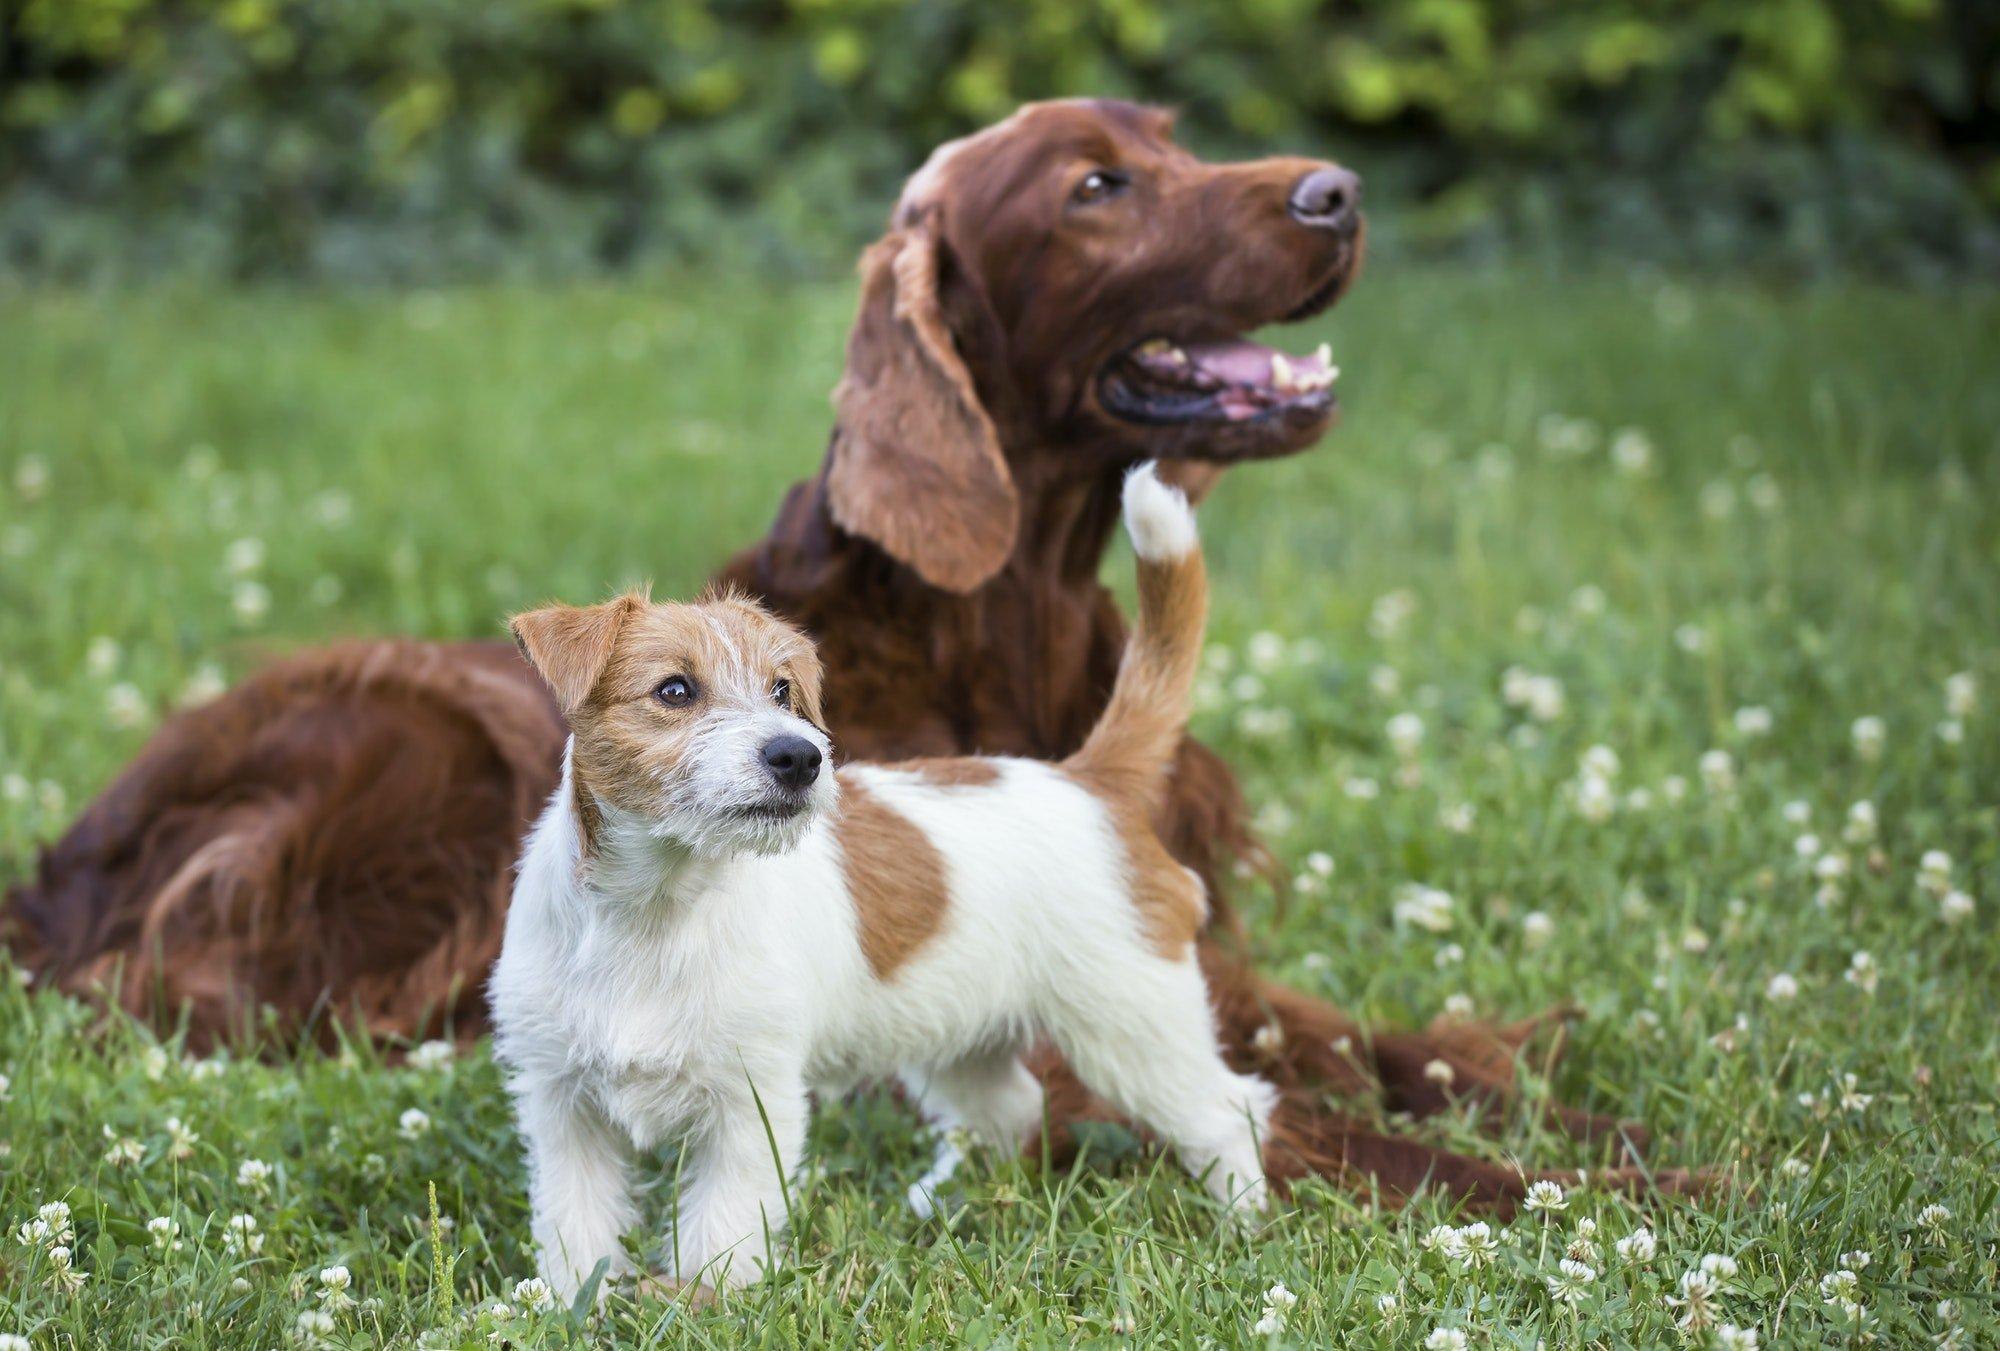 Dog friendship - happy pet friends